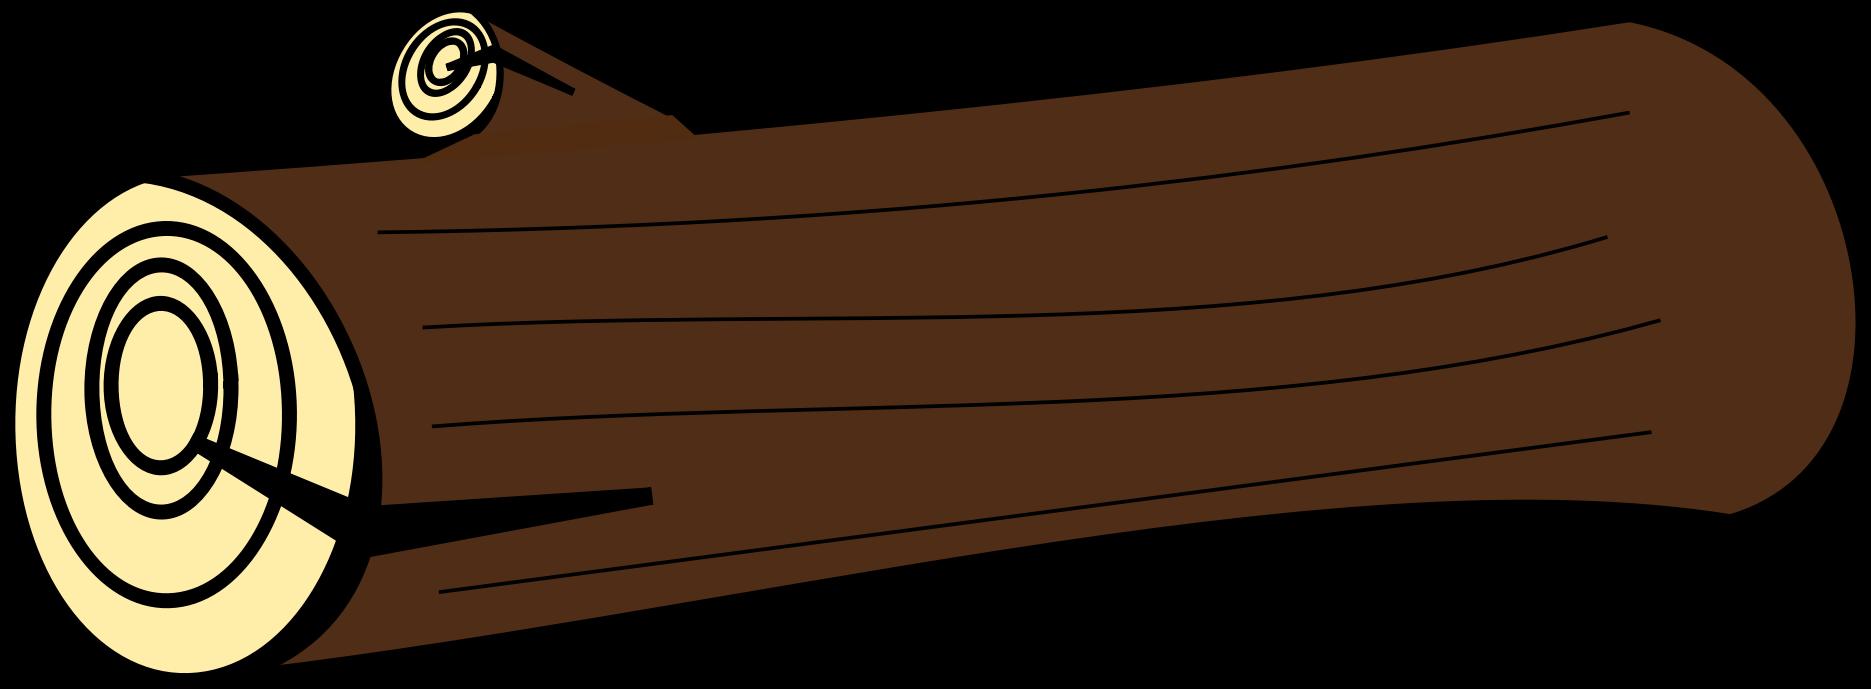 Wooden Log Clipart #1. BIG IMAGE (PNG)-Wooden Log Clipart #1. BIG IMAGE (PNG)-14